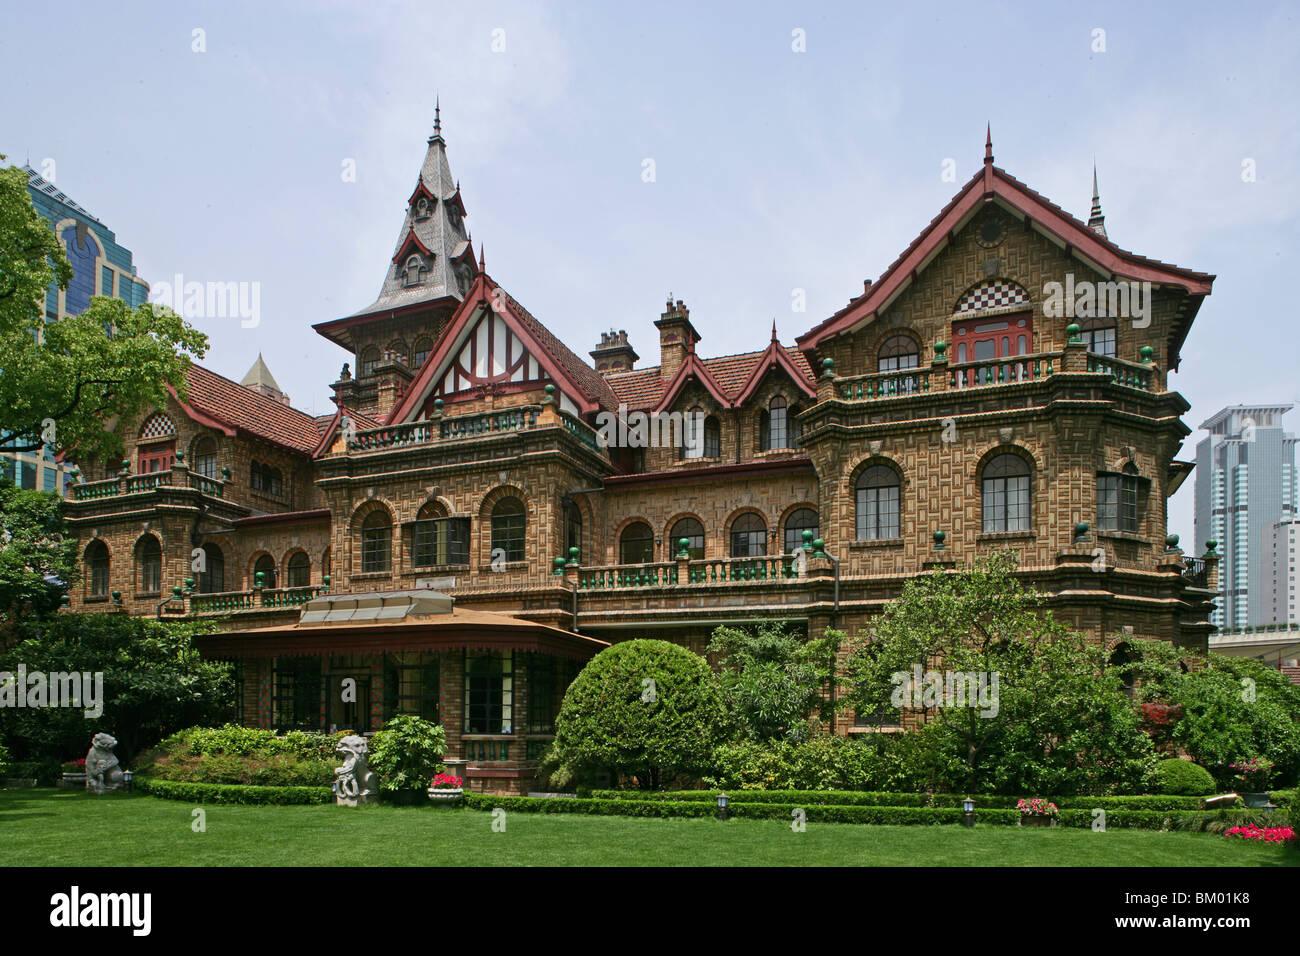 Moller Villa Hotel, fairytale gothic fantasy, brick building, 1936, Heng Shan group, garden - Stock Image